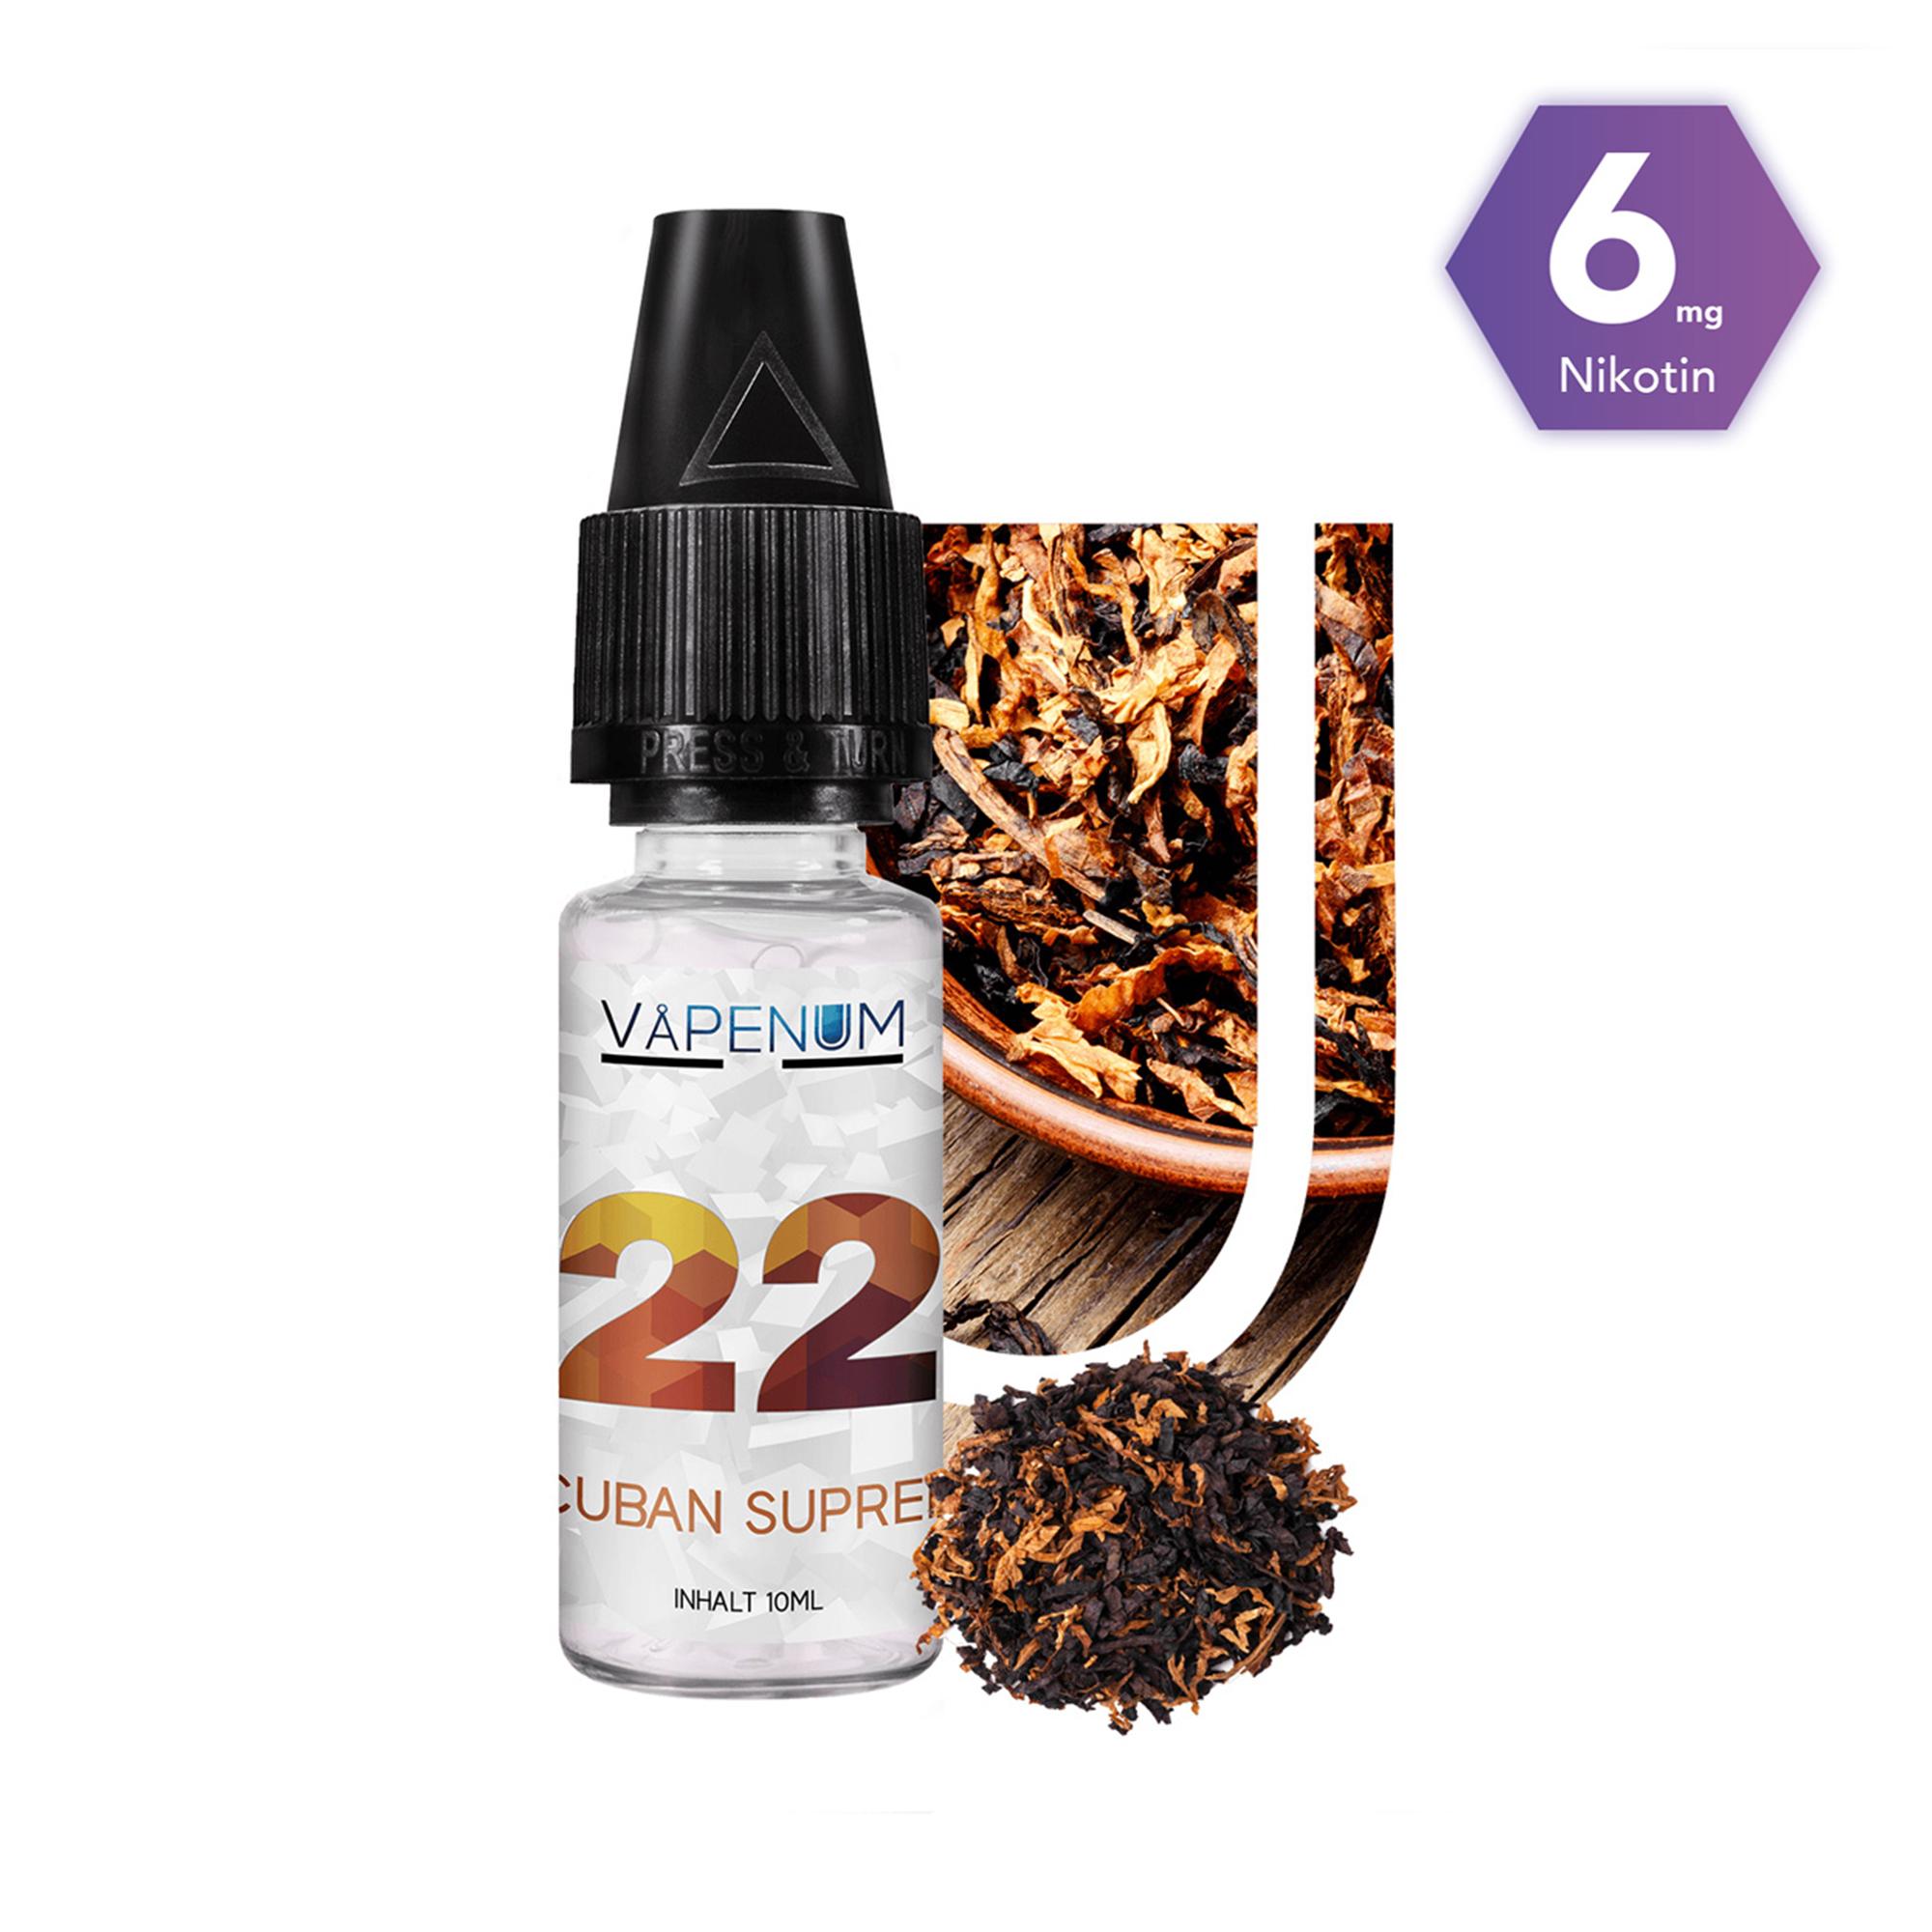 22 - Cuban Supreme Liquid by Vapenum